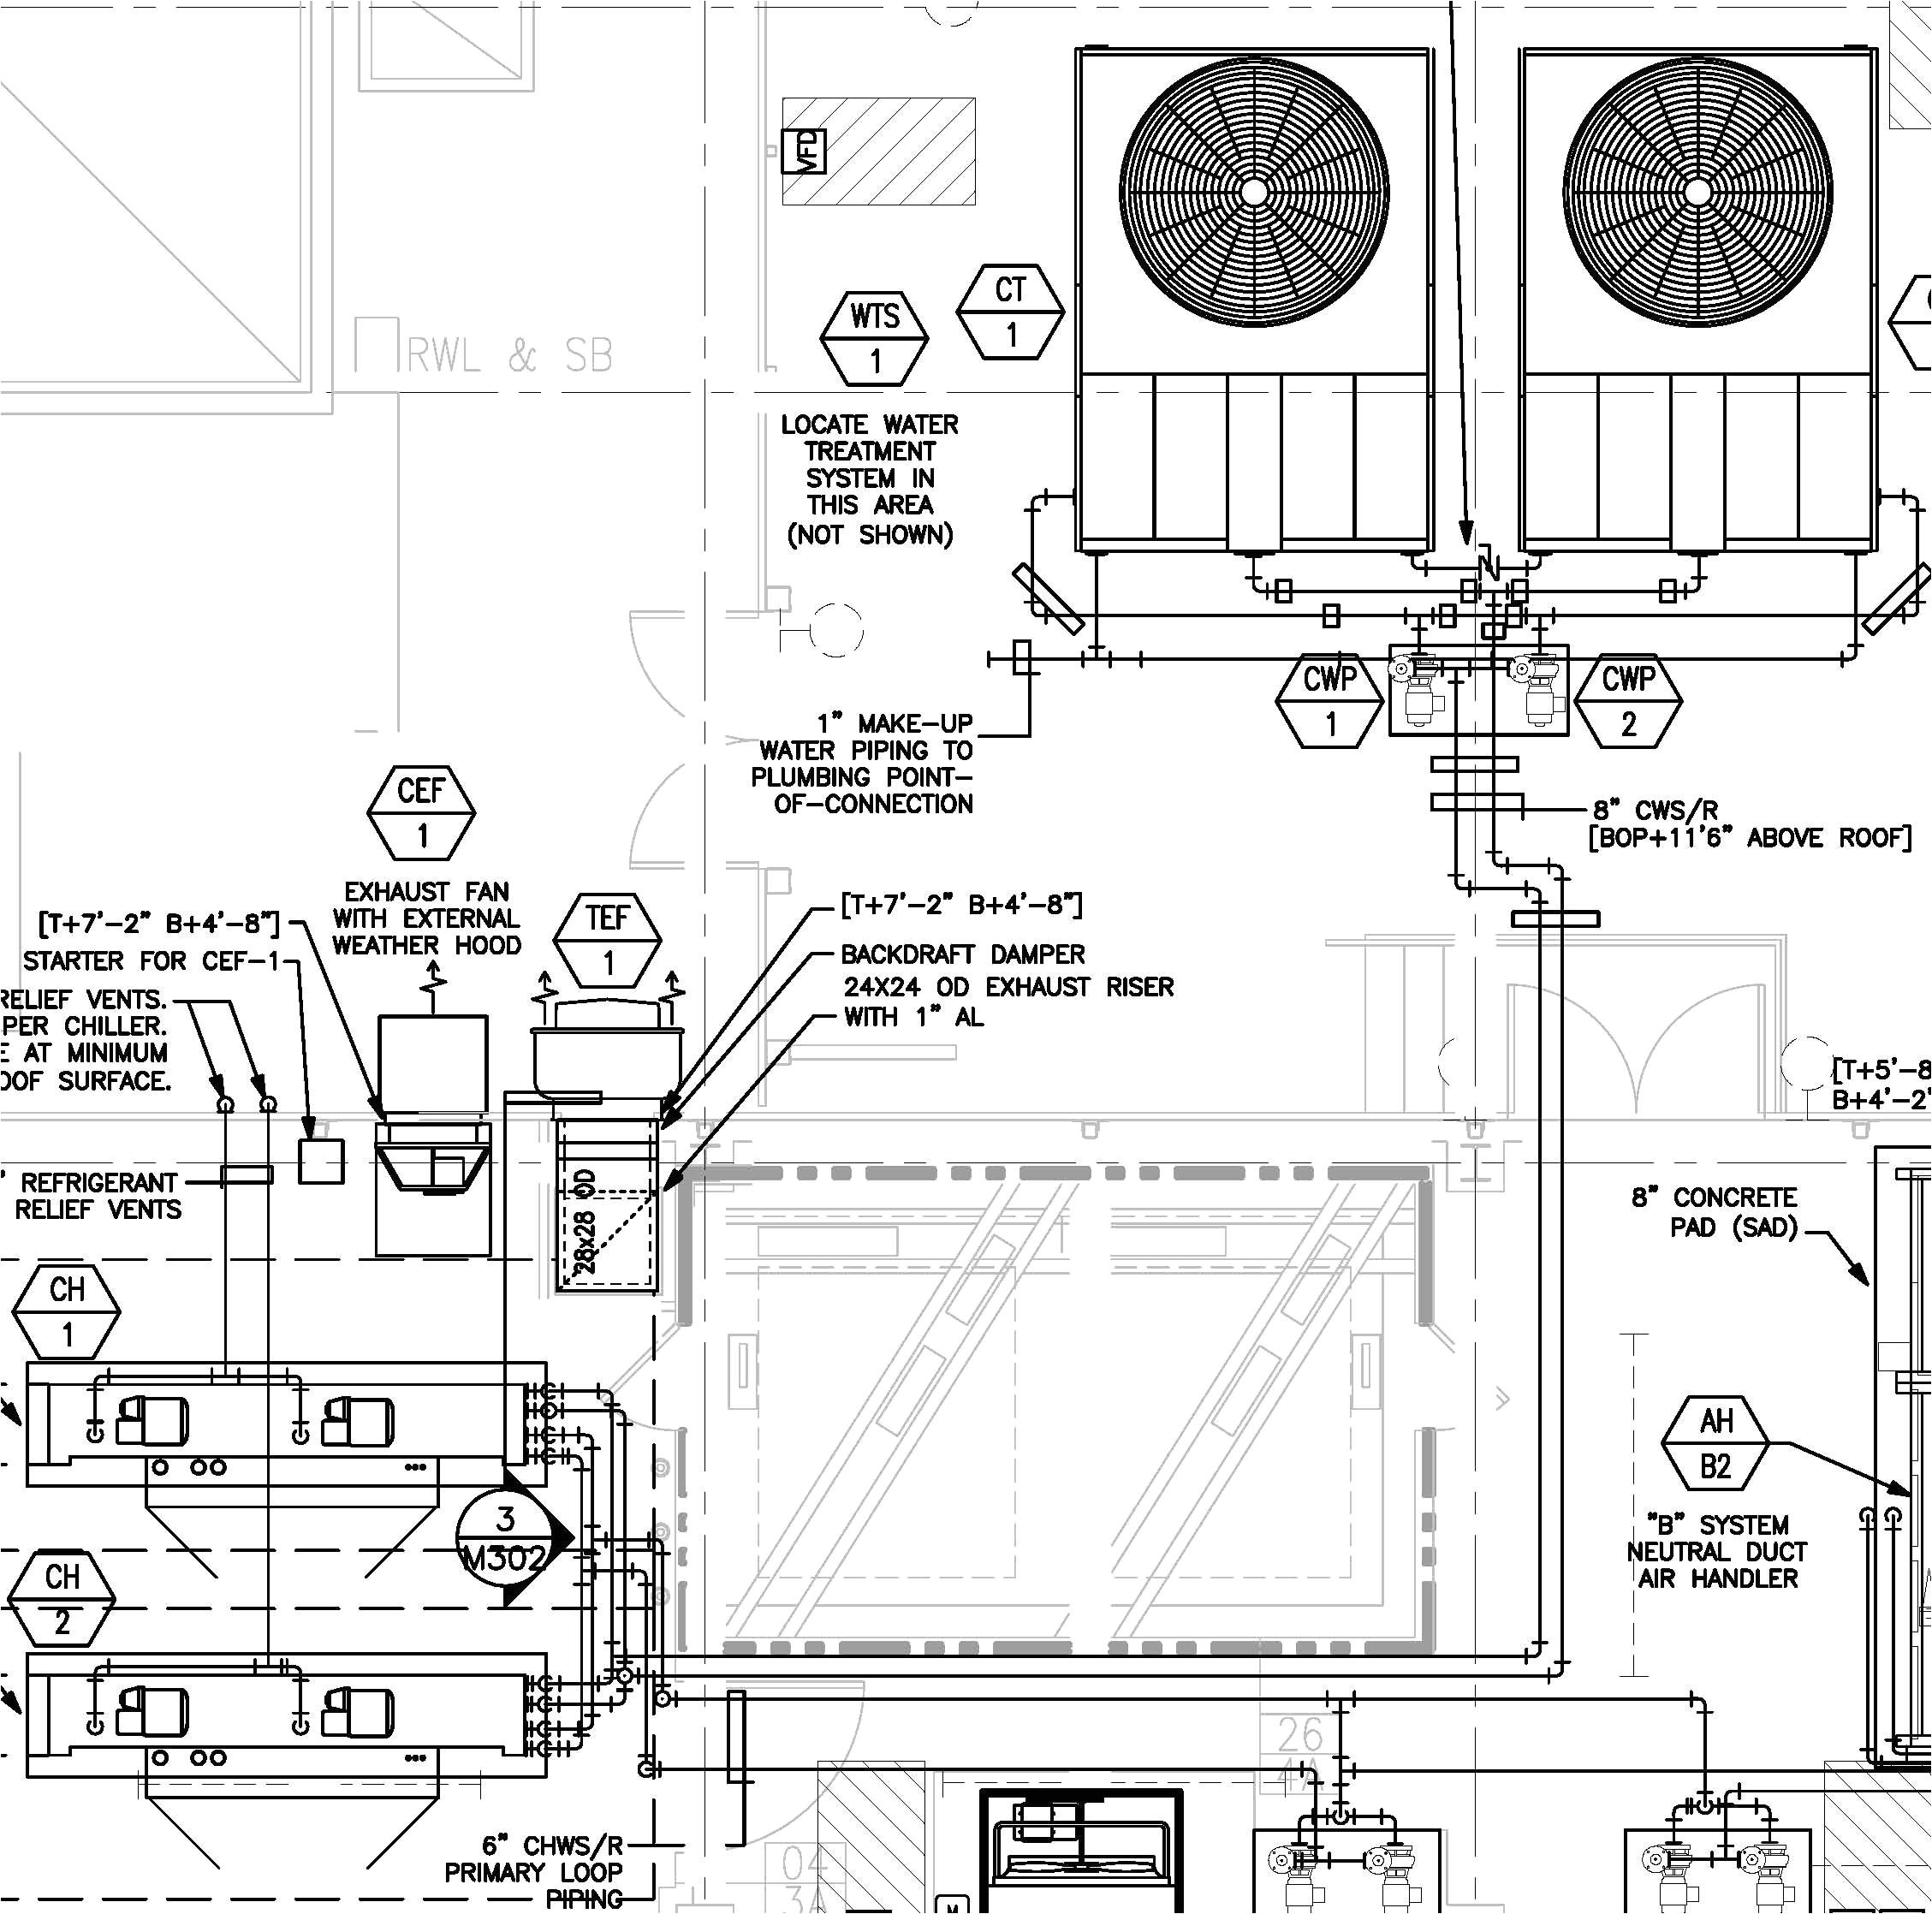 peterbilt wiring diagram free peterbilt wiring diagram awesome air conditioner wiring diagram picture unique peterbilt wiring diagram 4s jpg